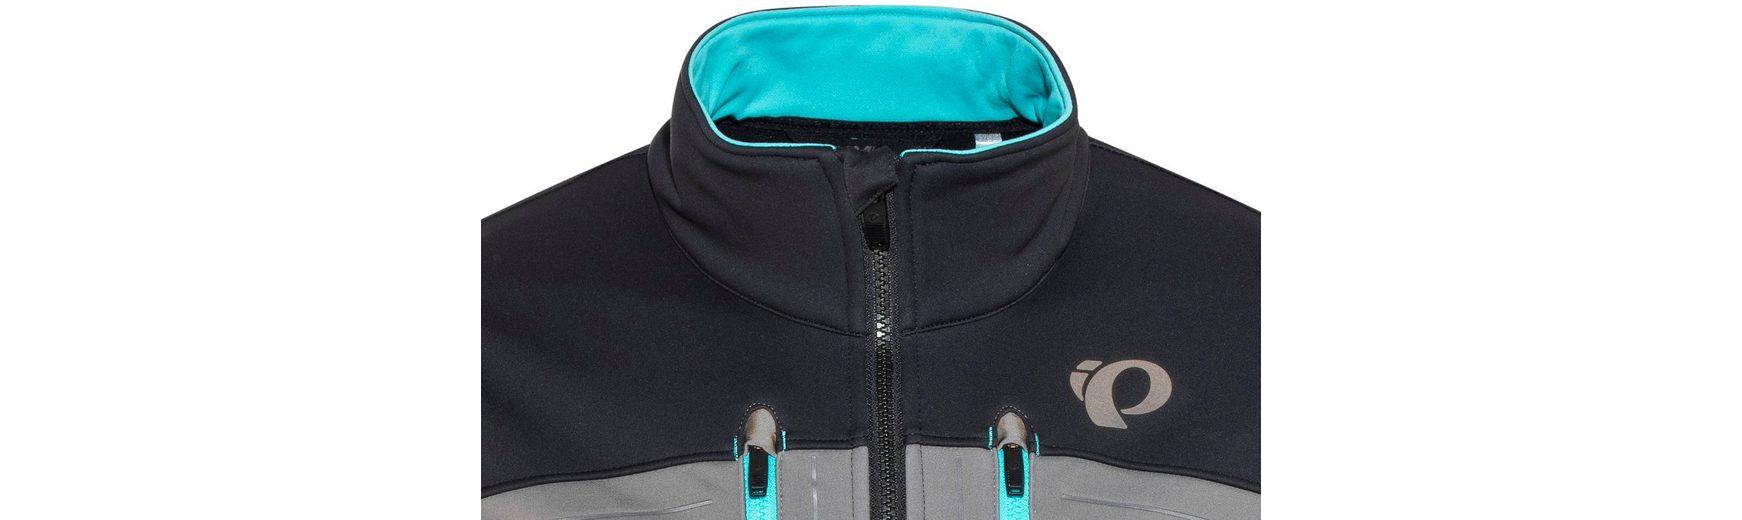 Pearl Izumi Softshelljacke Elite Escape Softshell Jacket Men Rabatt Geringe Versandgebühr Bester Online-Verkauf Rchmiq